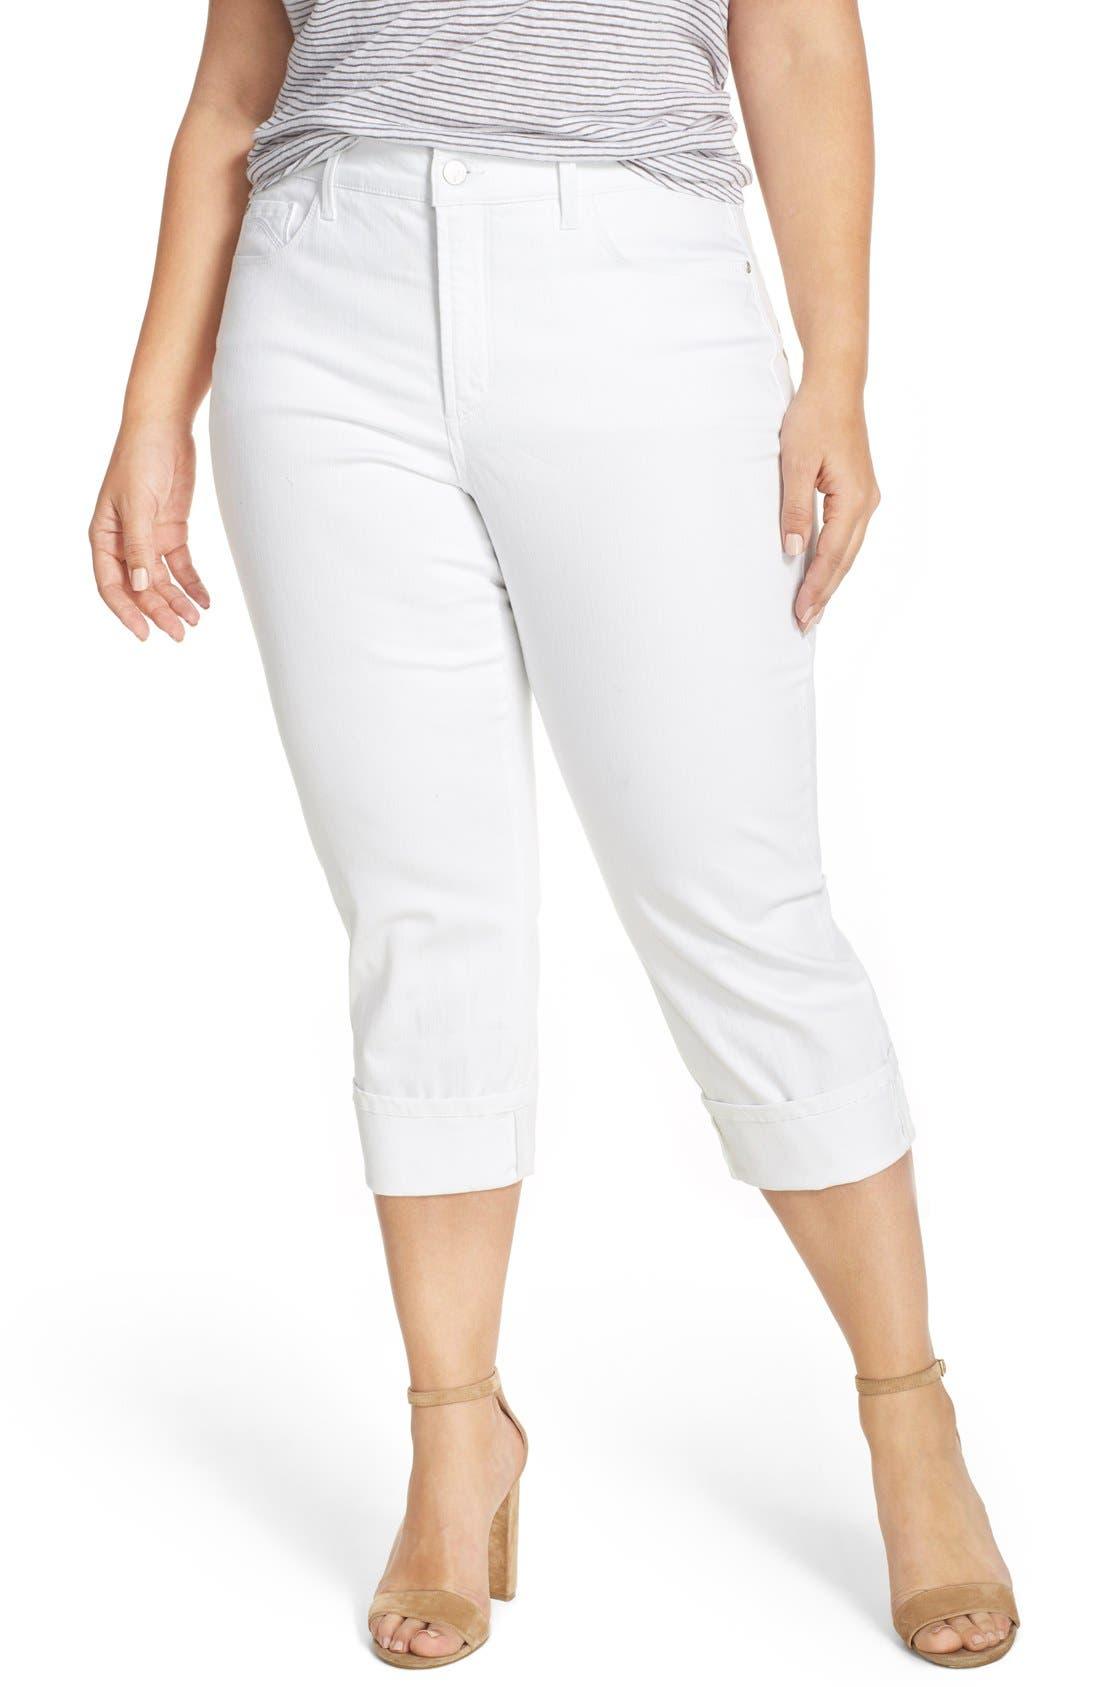 Alternate Image 1 Selected - NYDJ 'Dayla' Wide Cuff Stretch Crop Boyfriend Jeans (Plus Size)